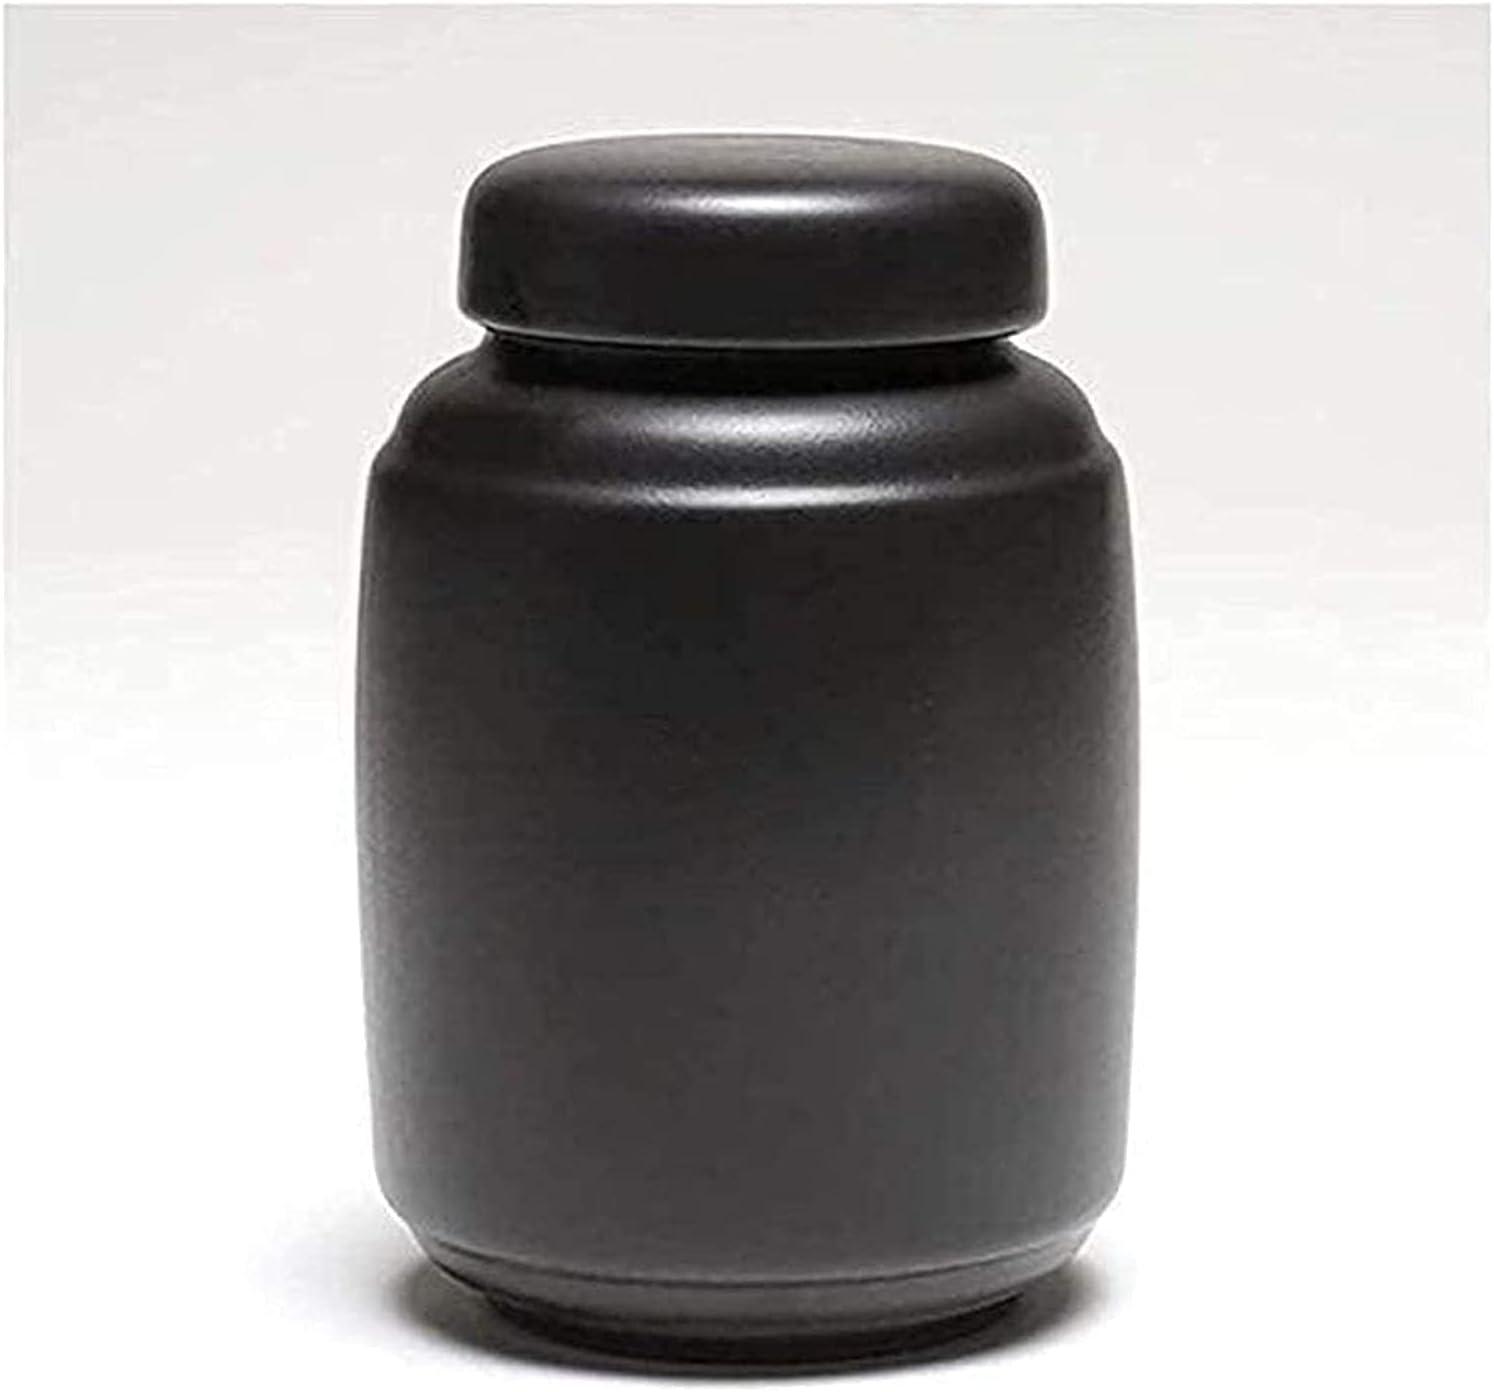 Max 57% OFF TTTTBBQ Mini Cremation urns Funeral Urn Cheap Cremati Sealed Jar Retro